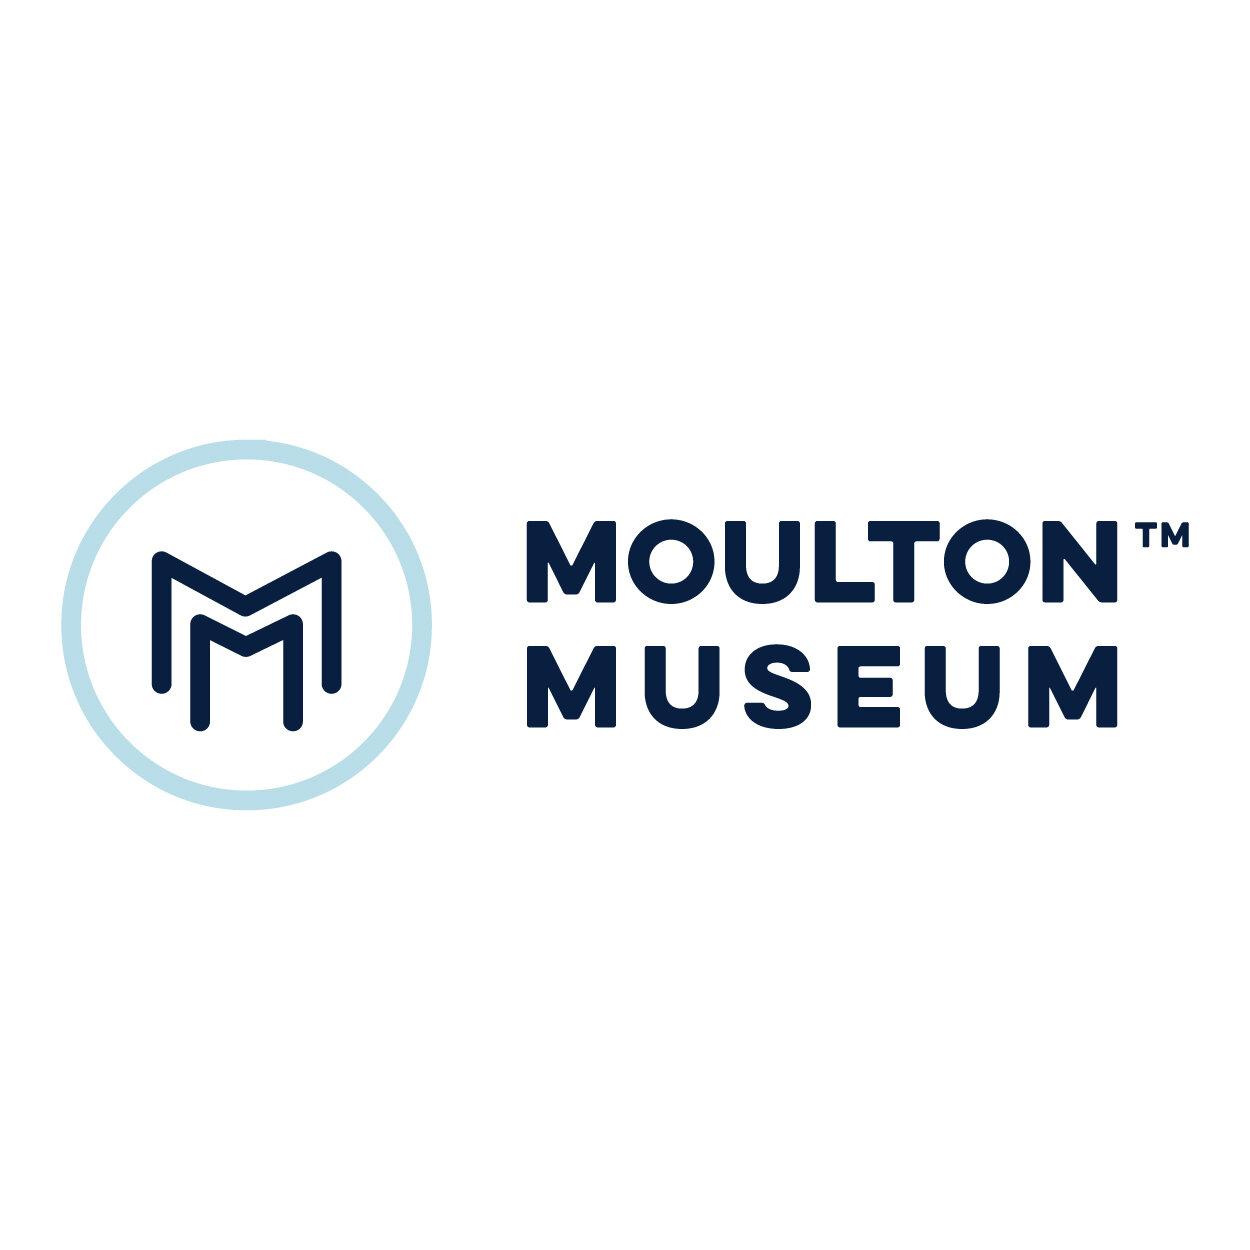 Moulton_Museum-01.jpg